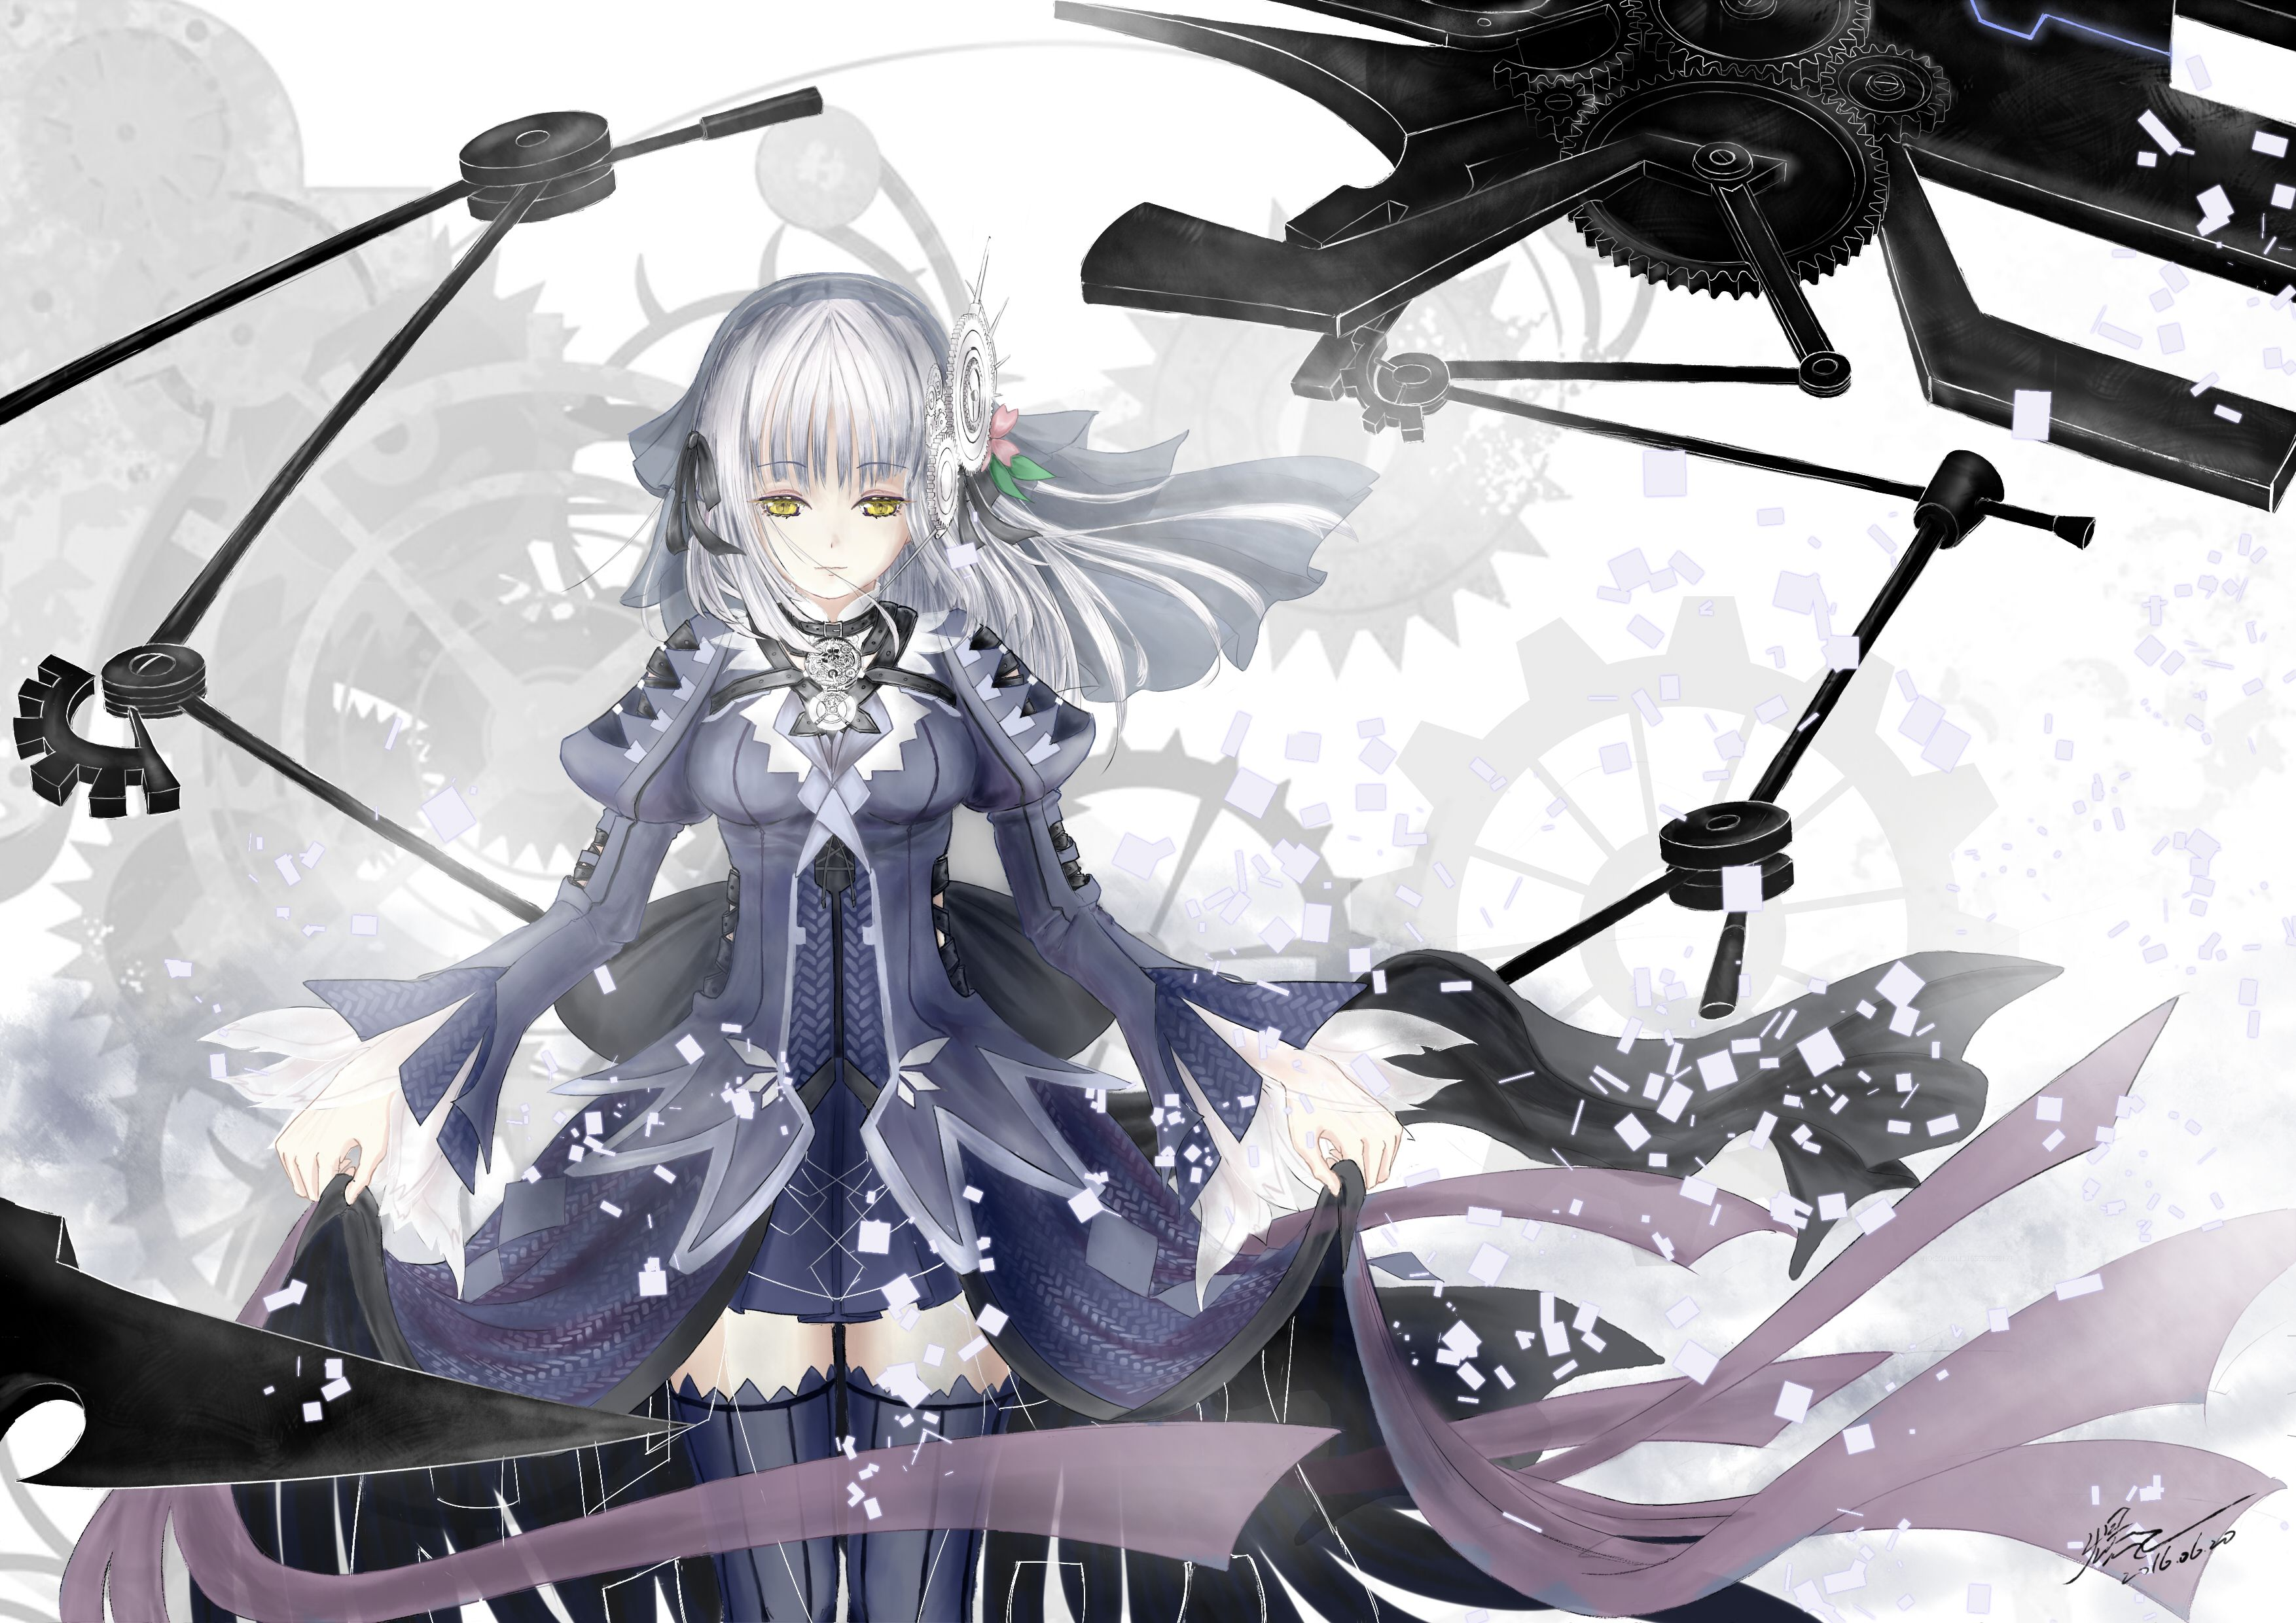 Pin de KURUMI en Clockwork Automatas, Anime